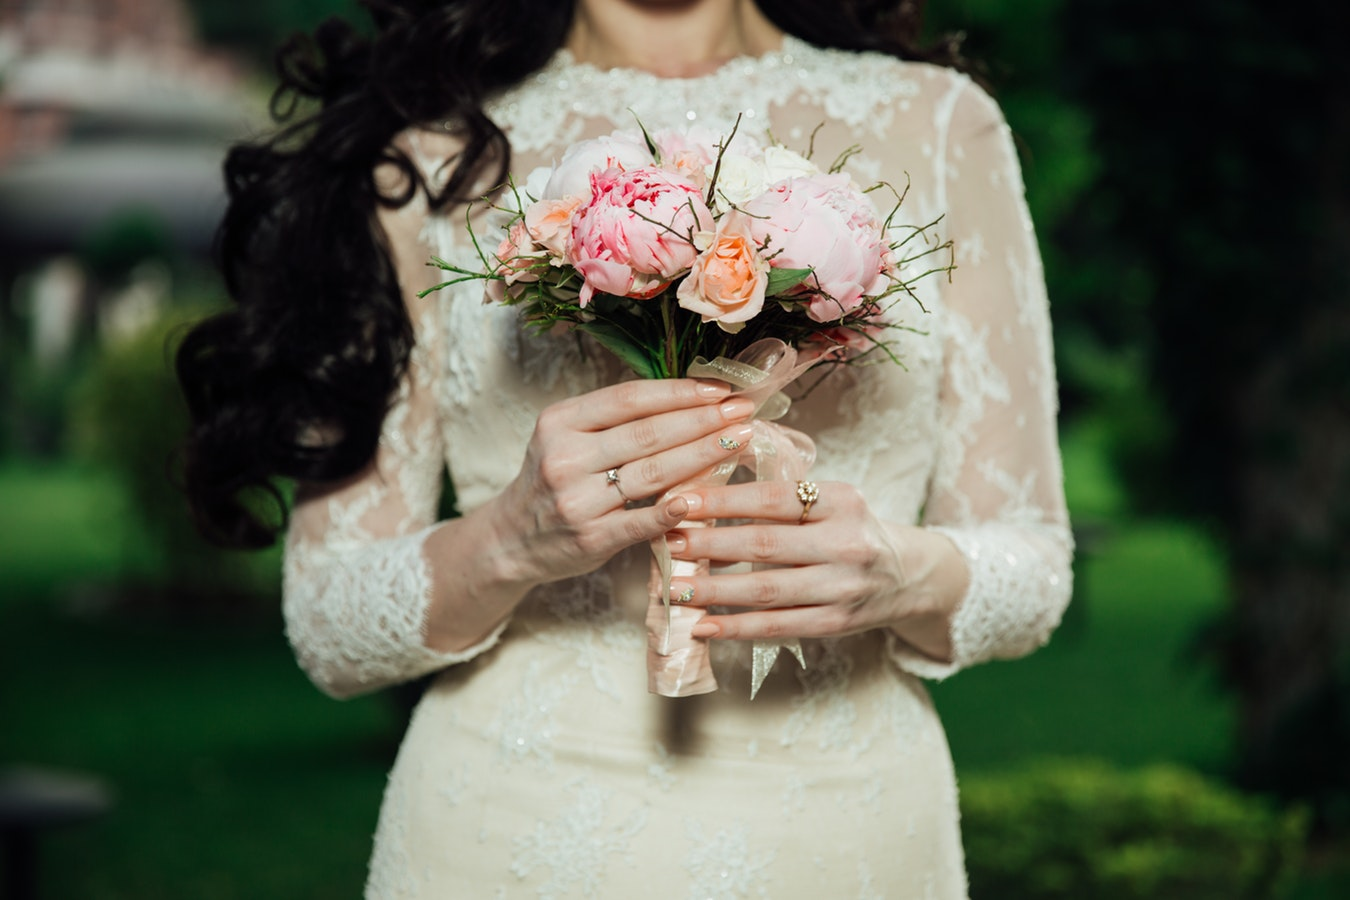 Le poesie dedicate al matrimonio di Nazim Hikmet Ran